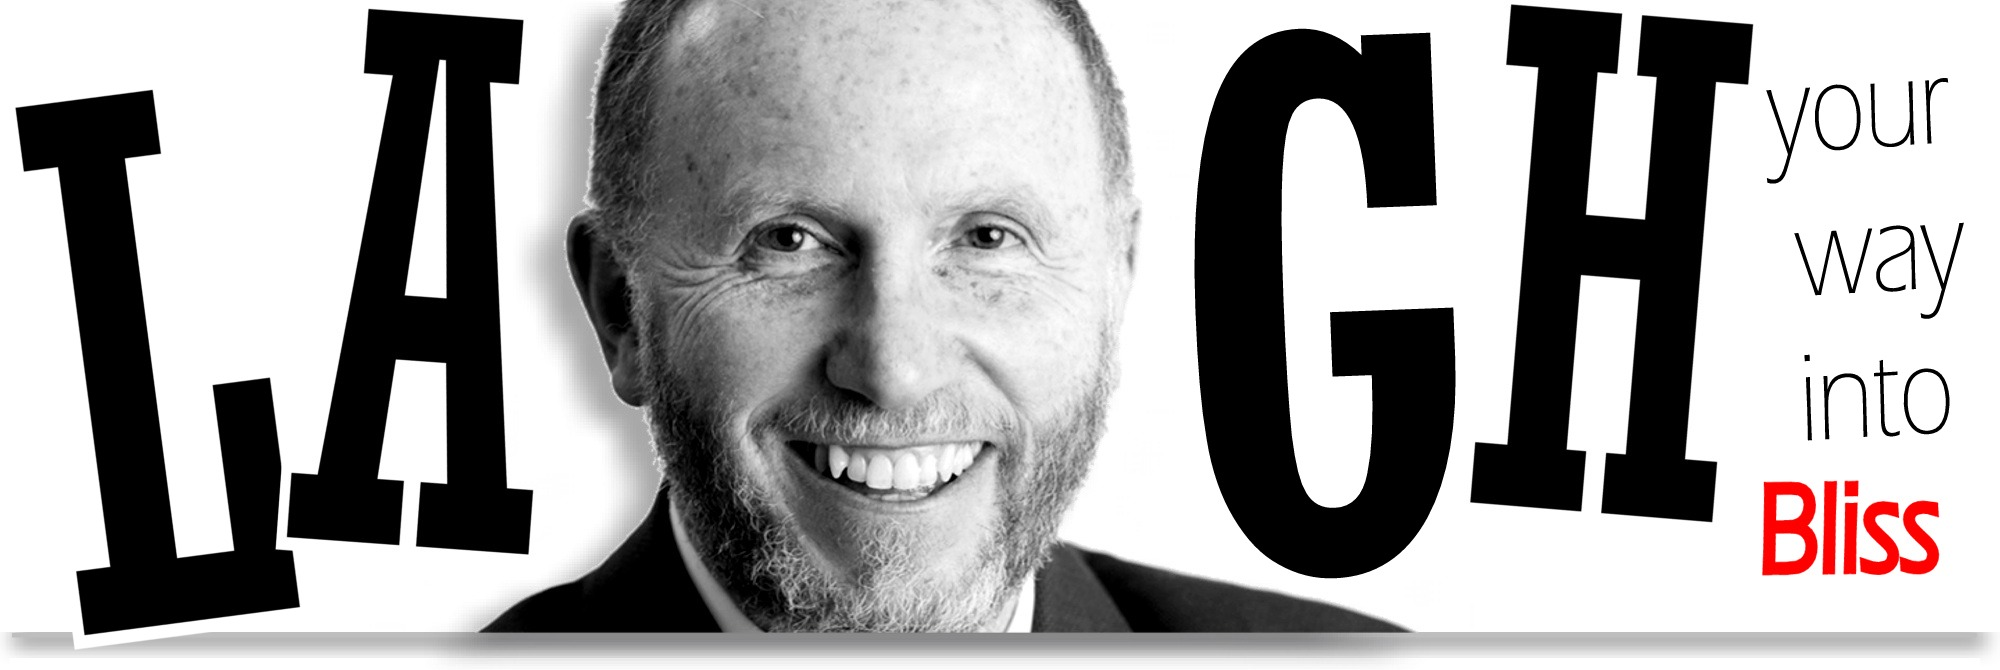 laugh your way to bliss Rabbi Stephen Baars.jpg